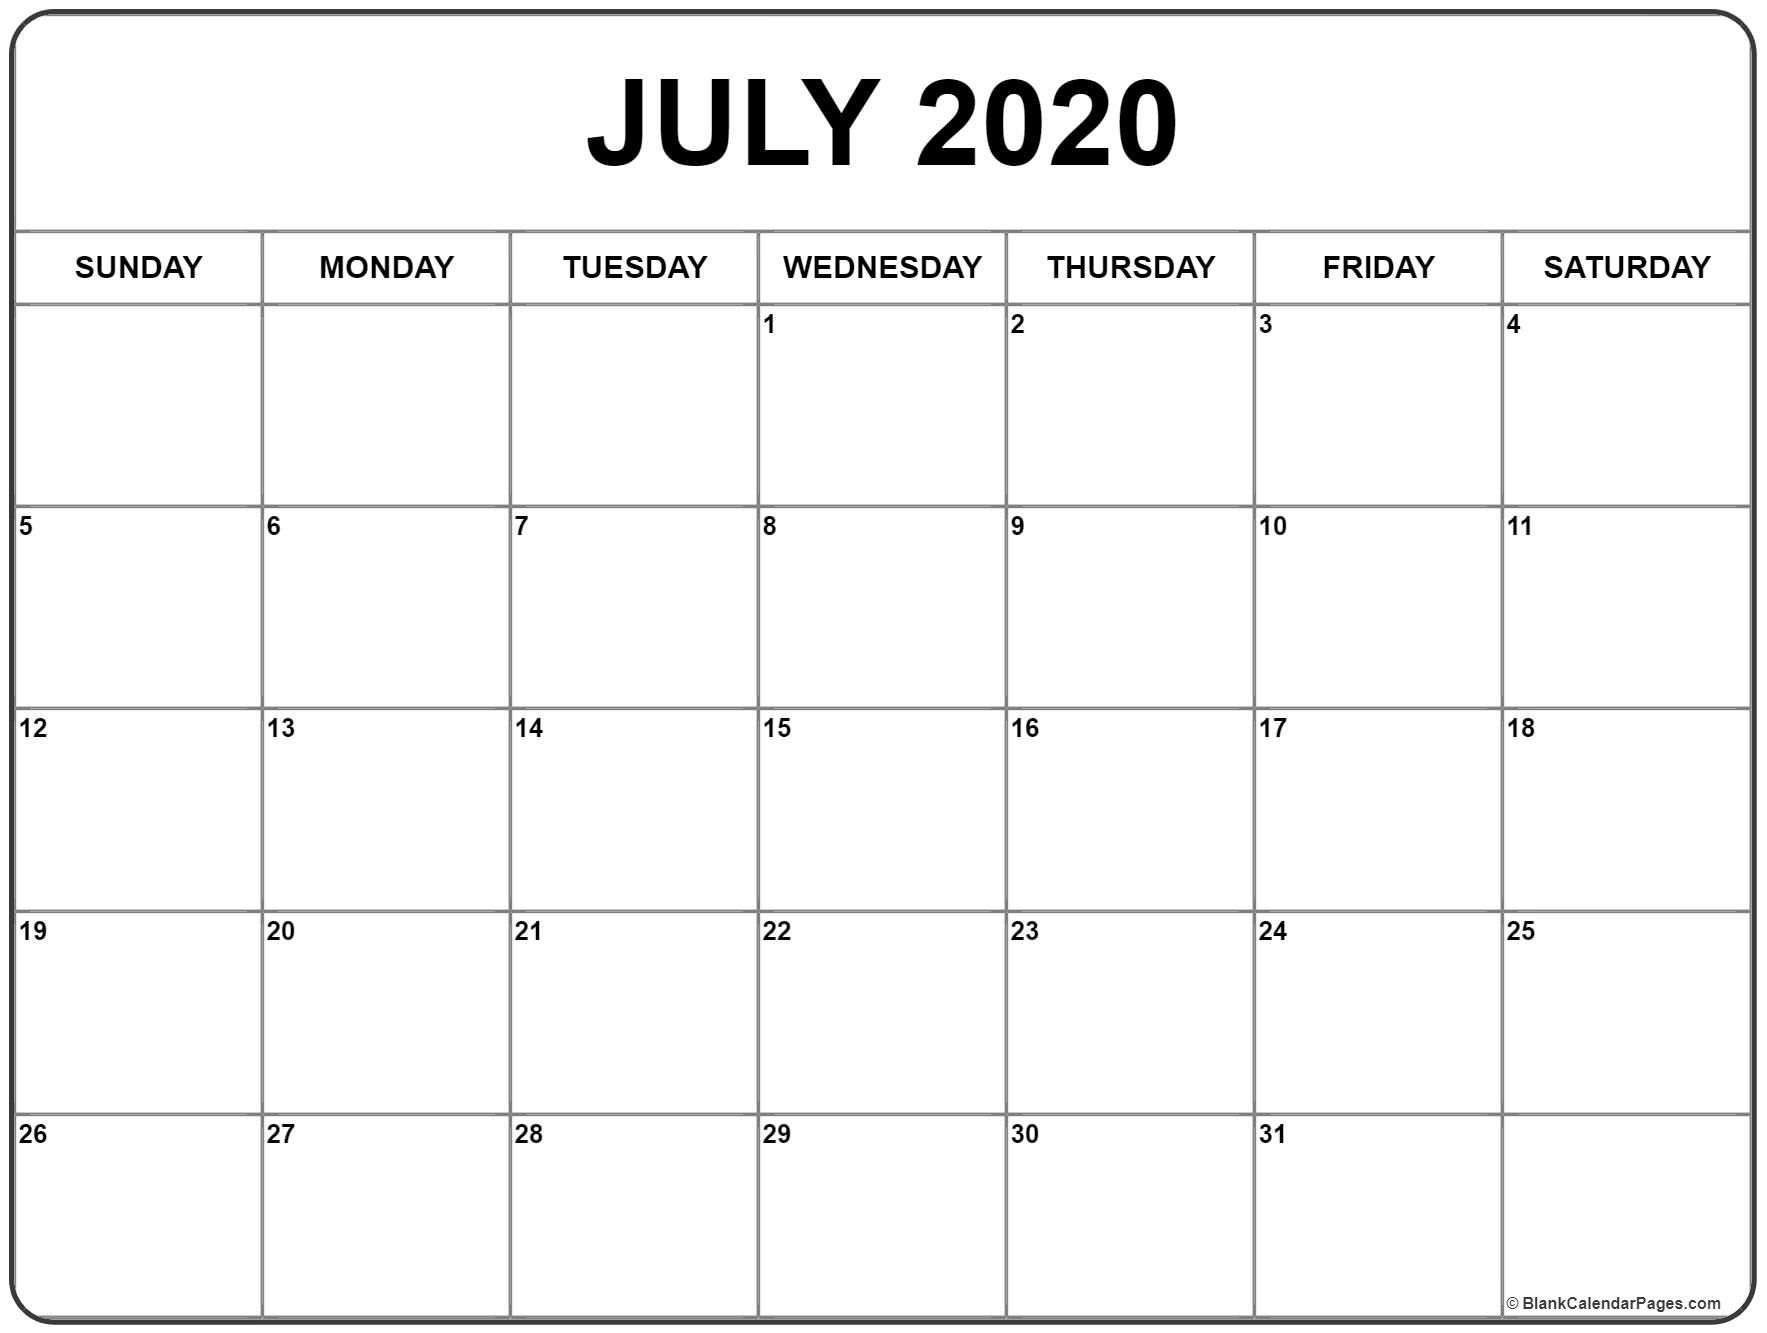 July 2020 Calendar | Printable Calendars | Printable Blank